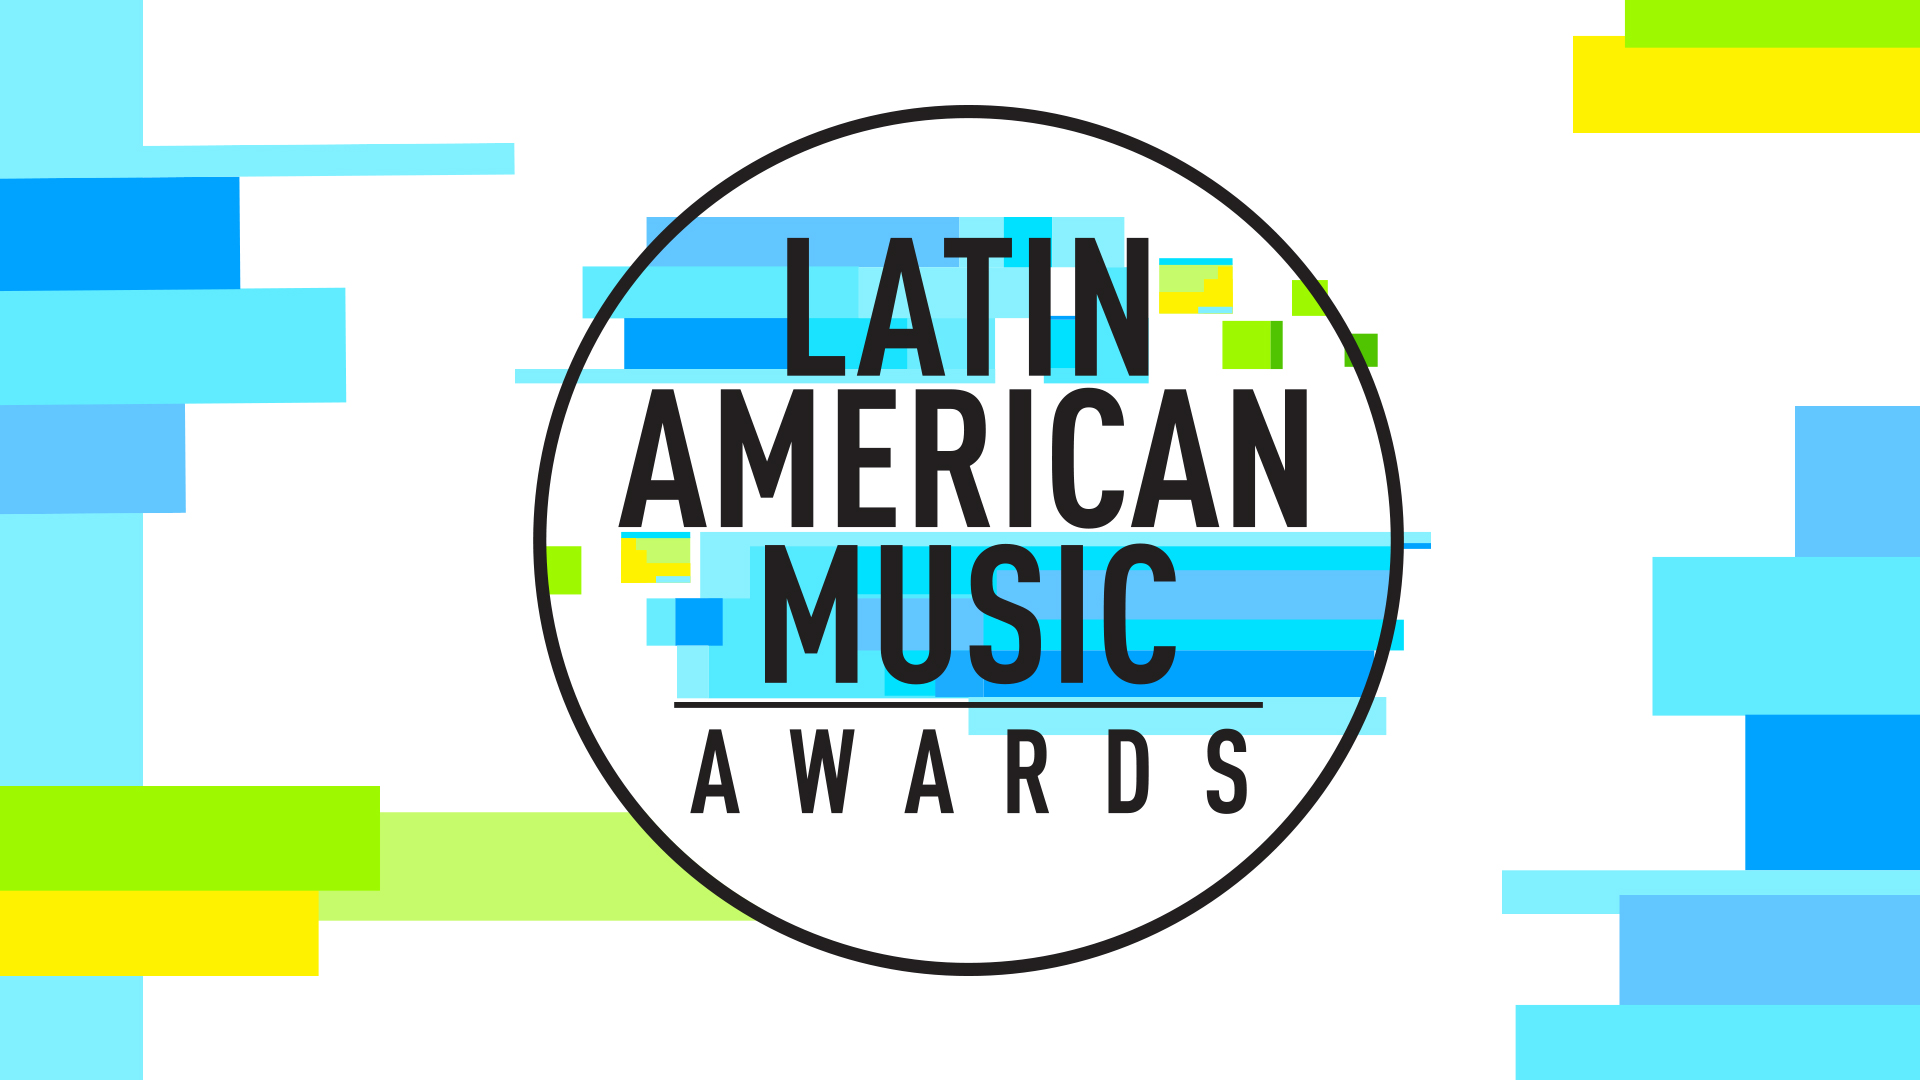 Latin American Music Awards 2019 Telemundo 1920x1080